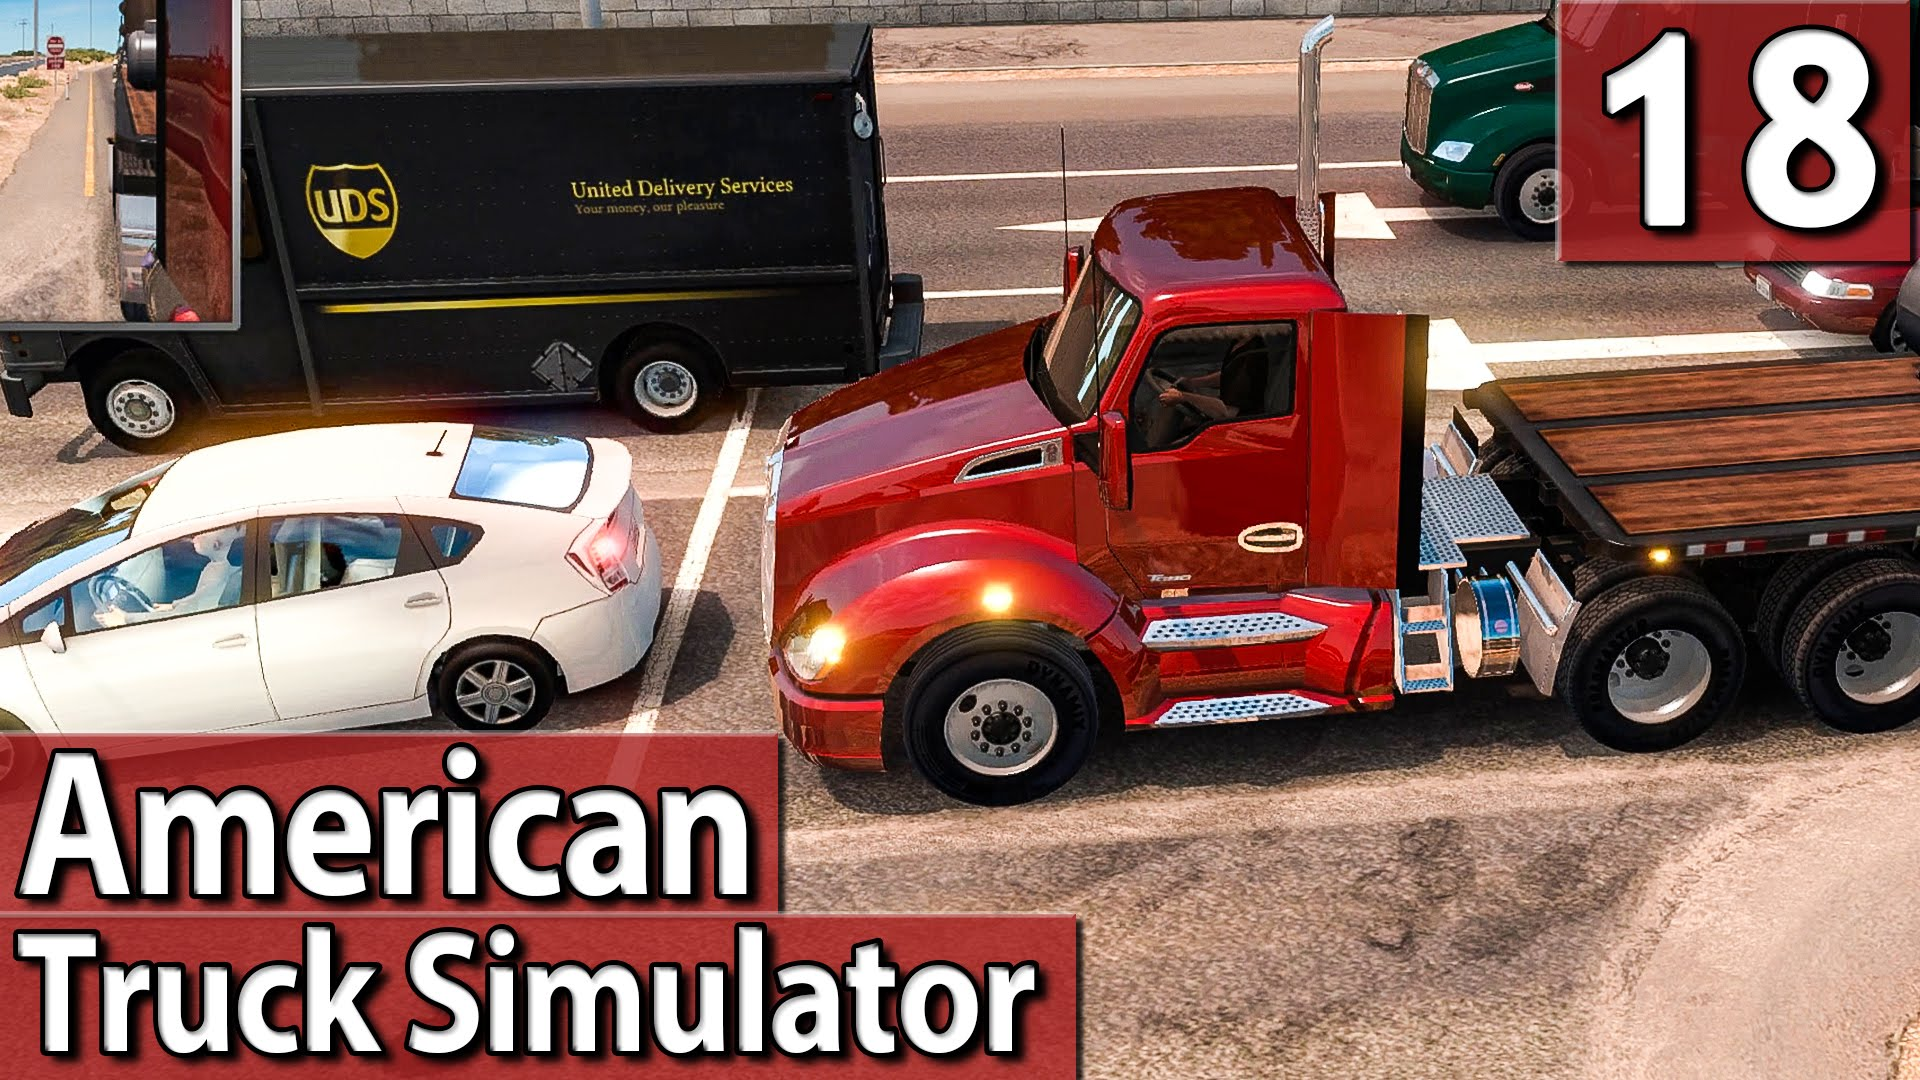 AMERICAN TRUCK SIMULATOR #18 Stop And Go Ampel PlayTest deutsch